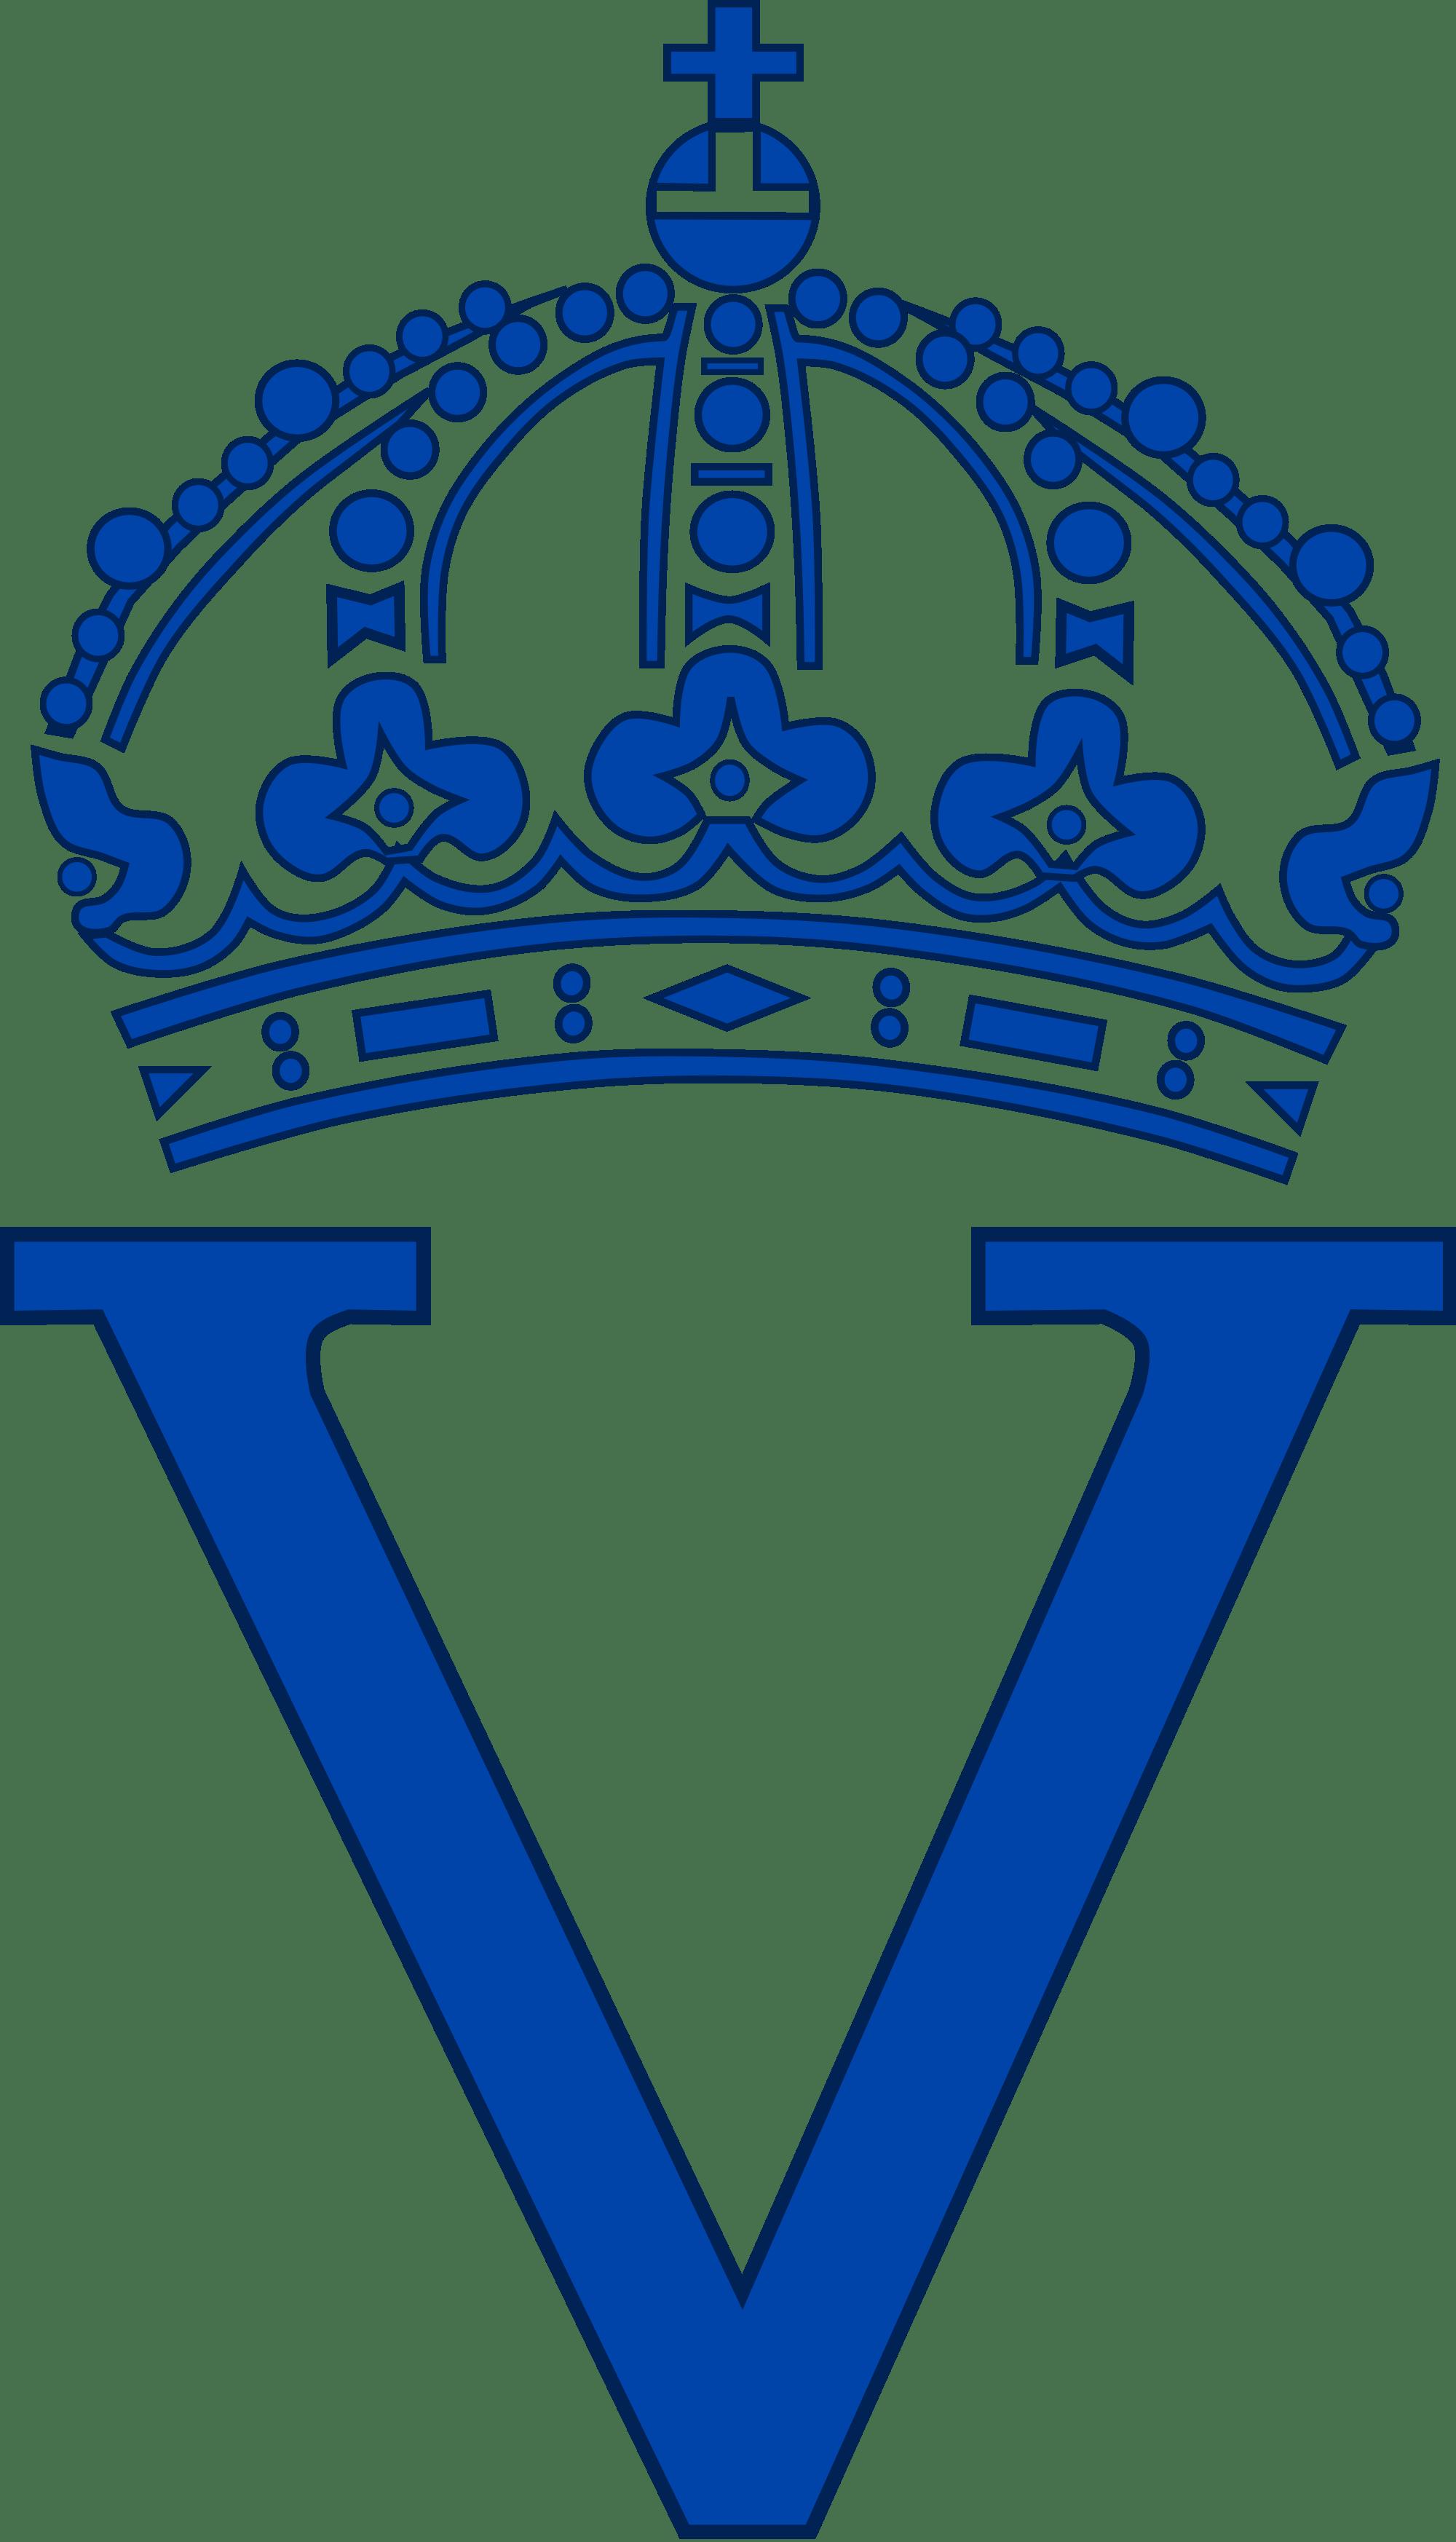 Royal monogram queen victoria. Crown vic clipart